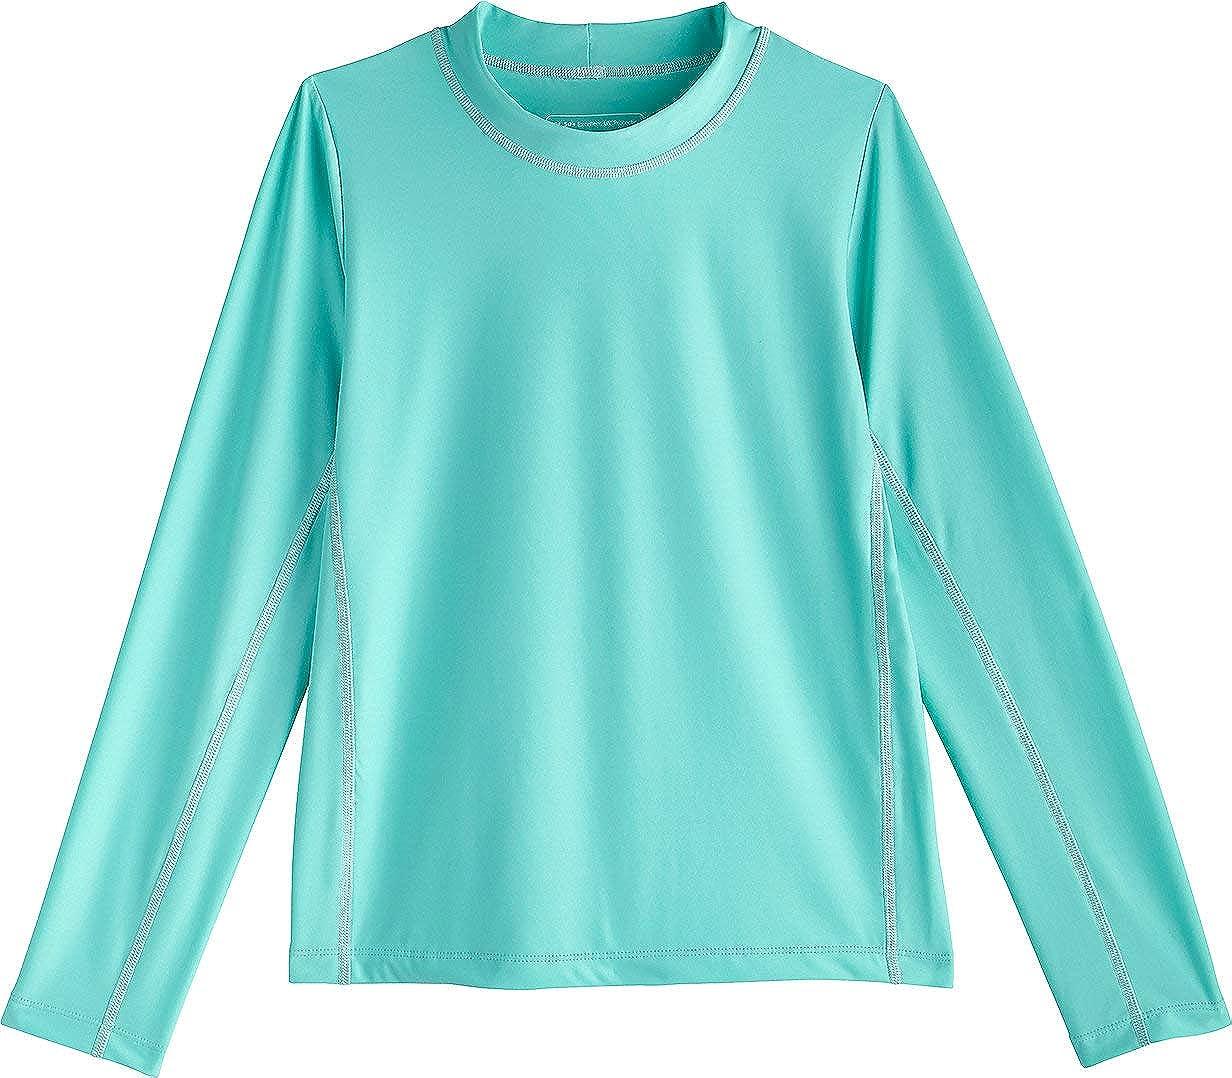 Sun Protective Kids Long Sleeve Surf Shirt Coolibar UPF 50